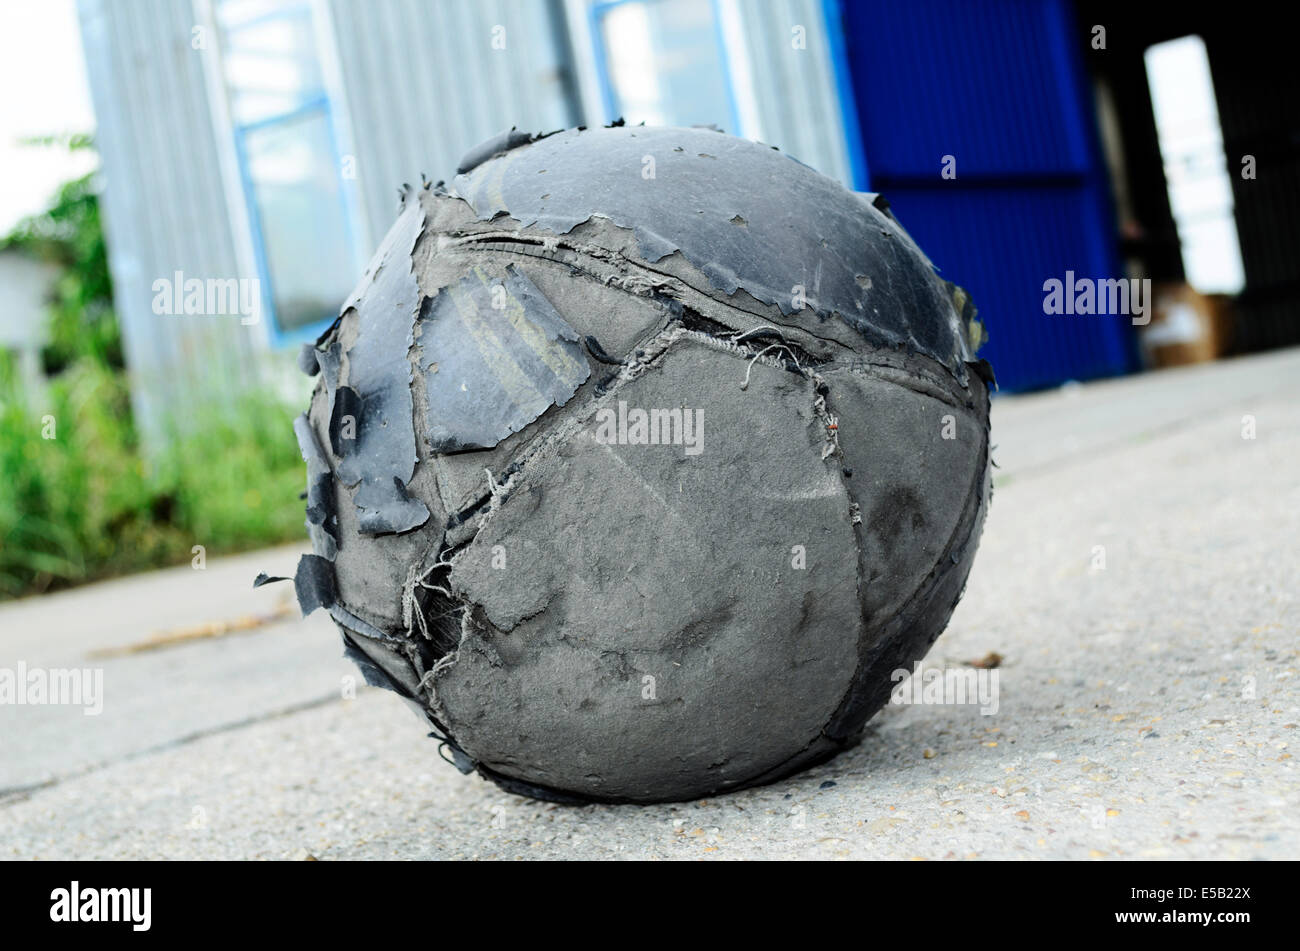 Old football ball badly ragged Stock Photo